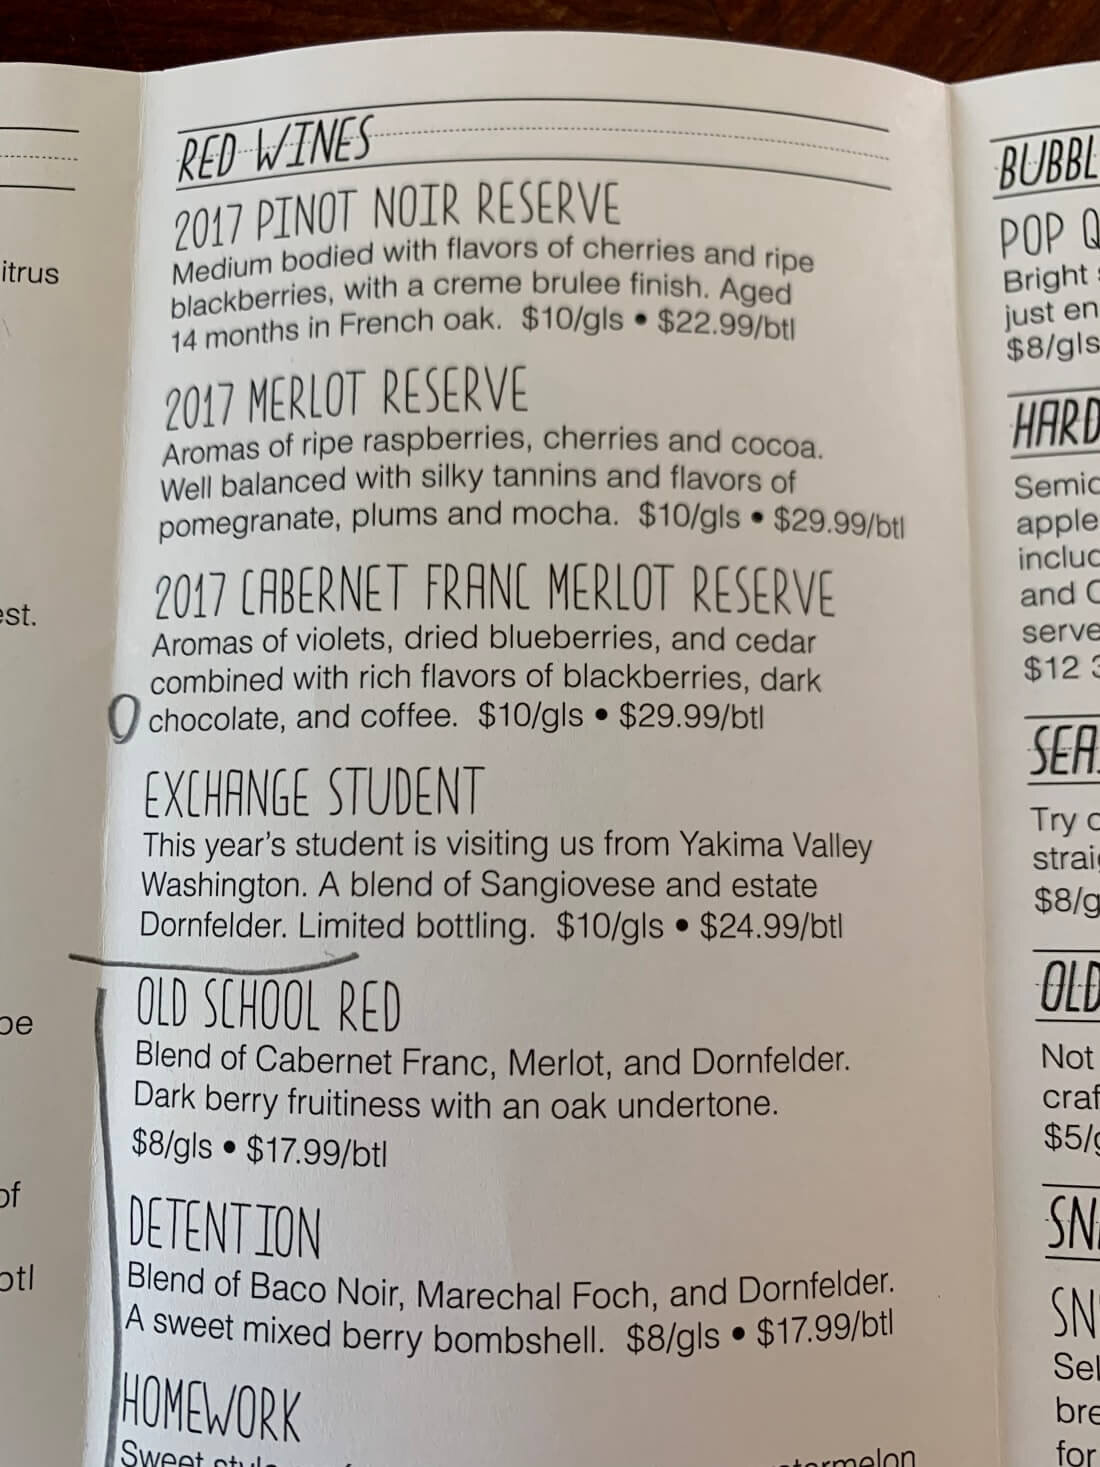 Wine menu at Peninsula Cellars Winery in Traverse City, Michigan